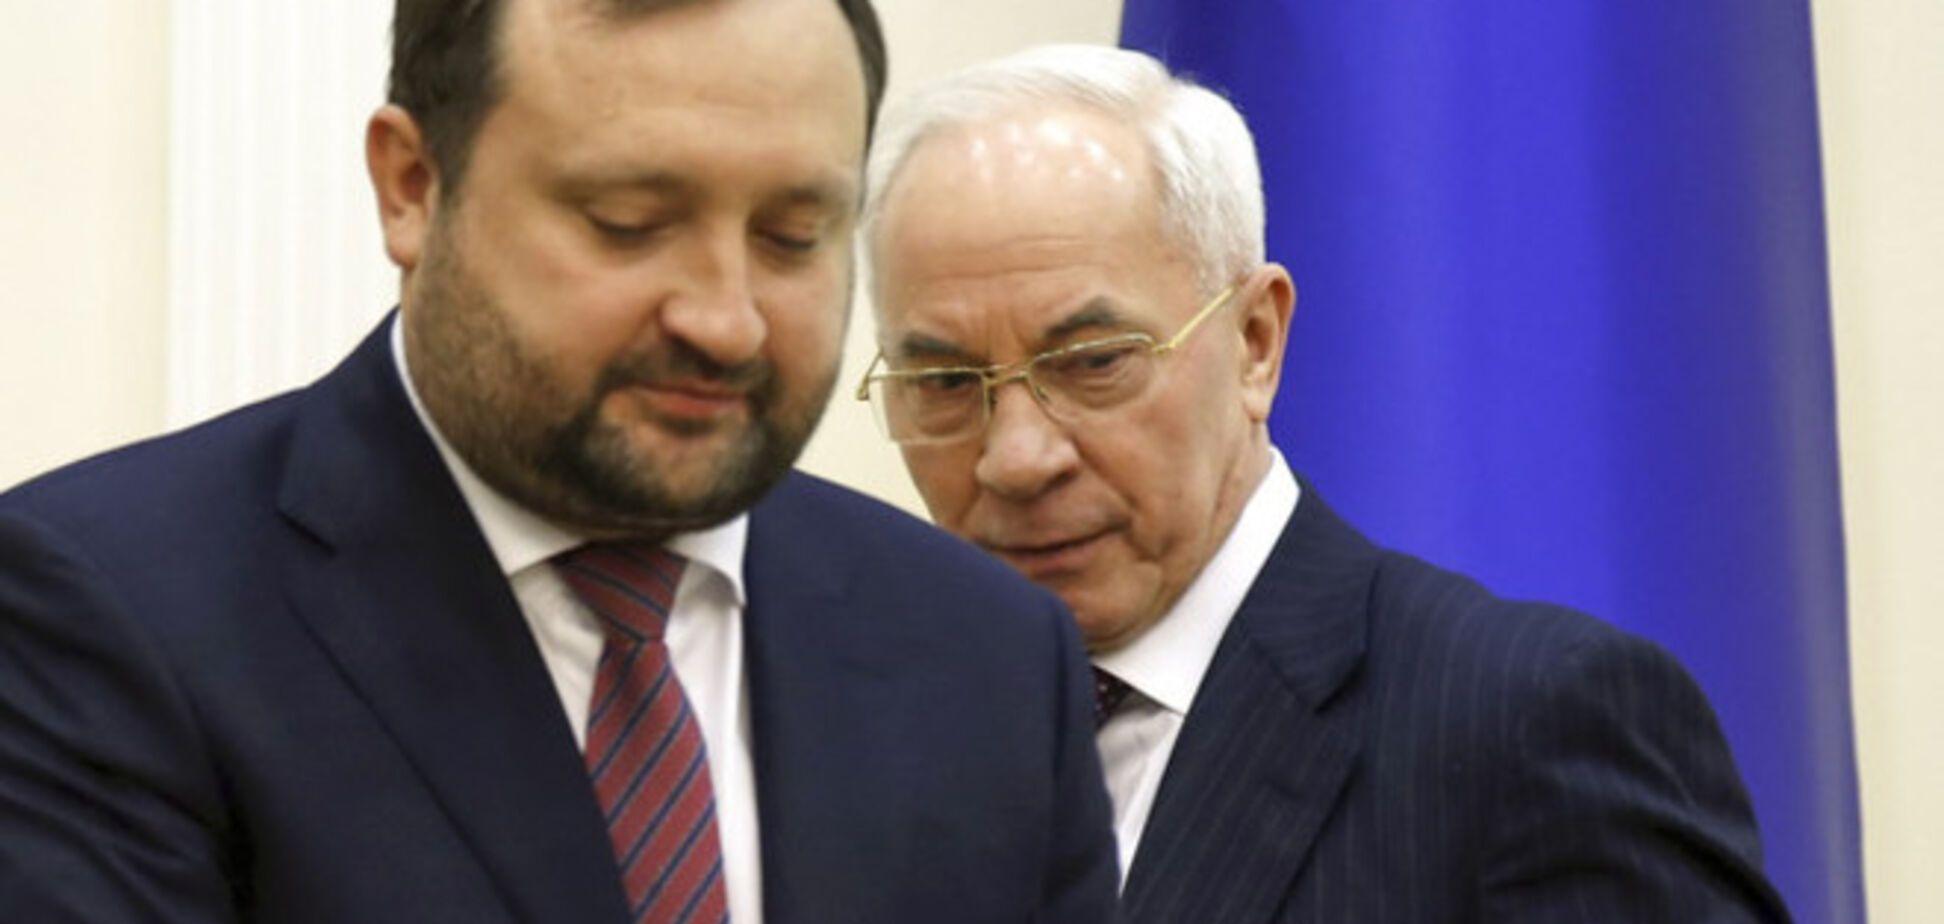 ГПУ: Арбузов растратил 120 млн грн госсредств при создании телеканала